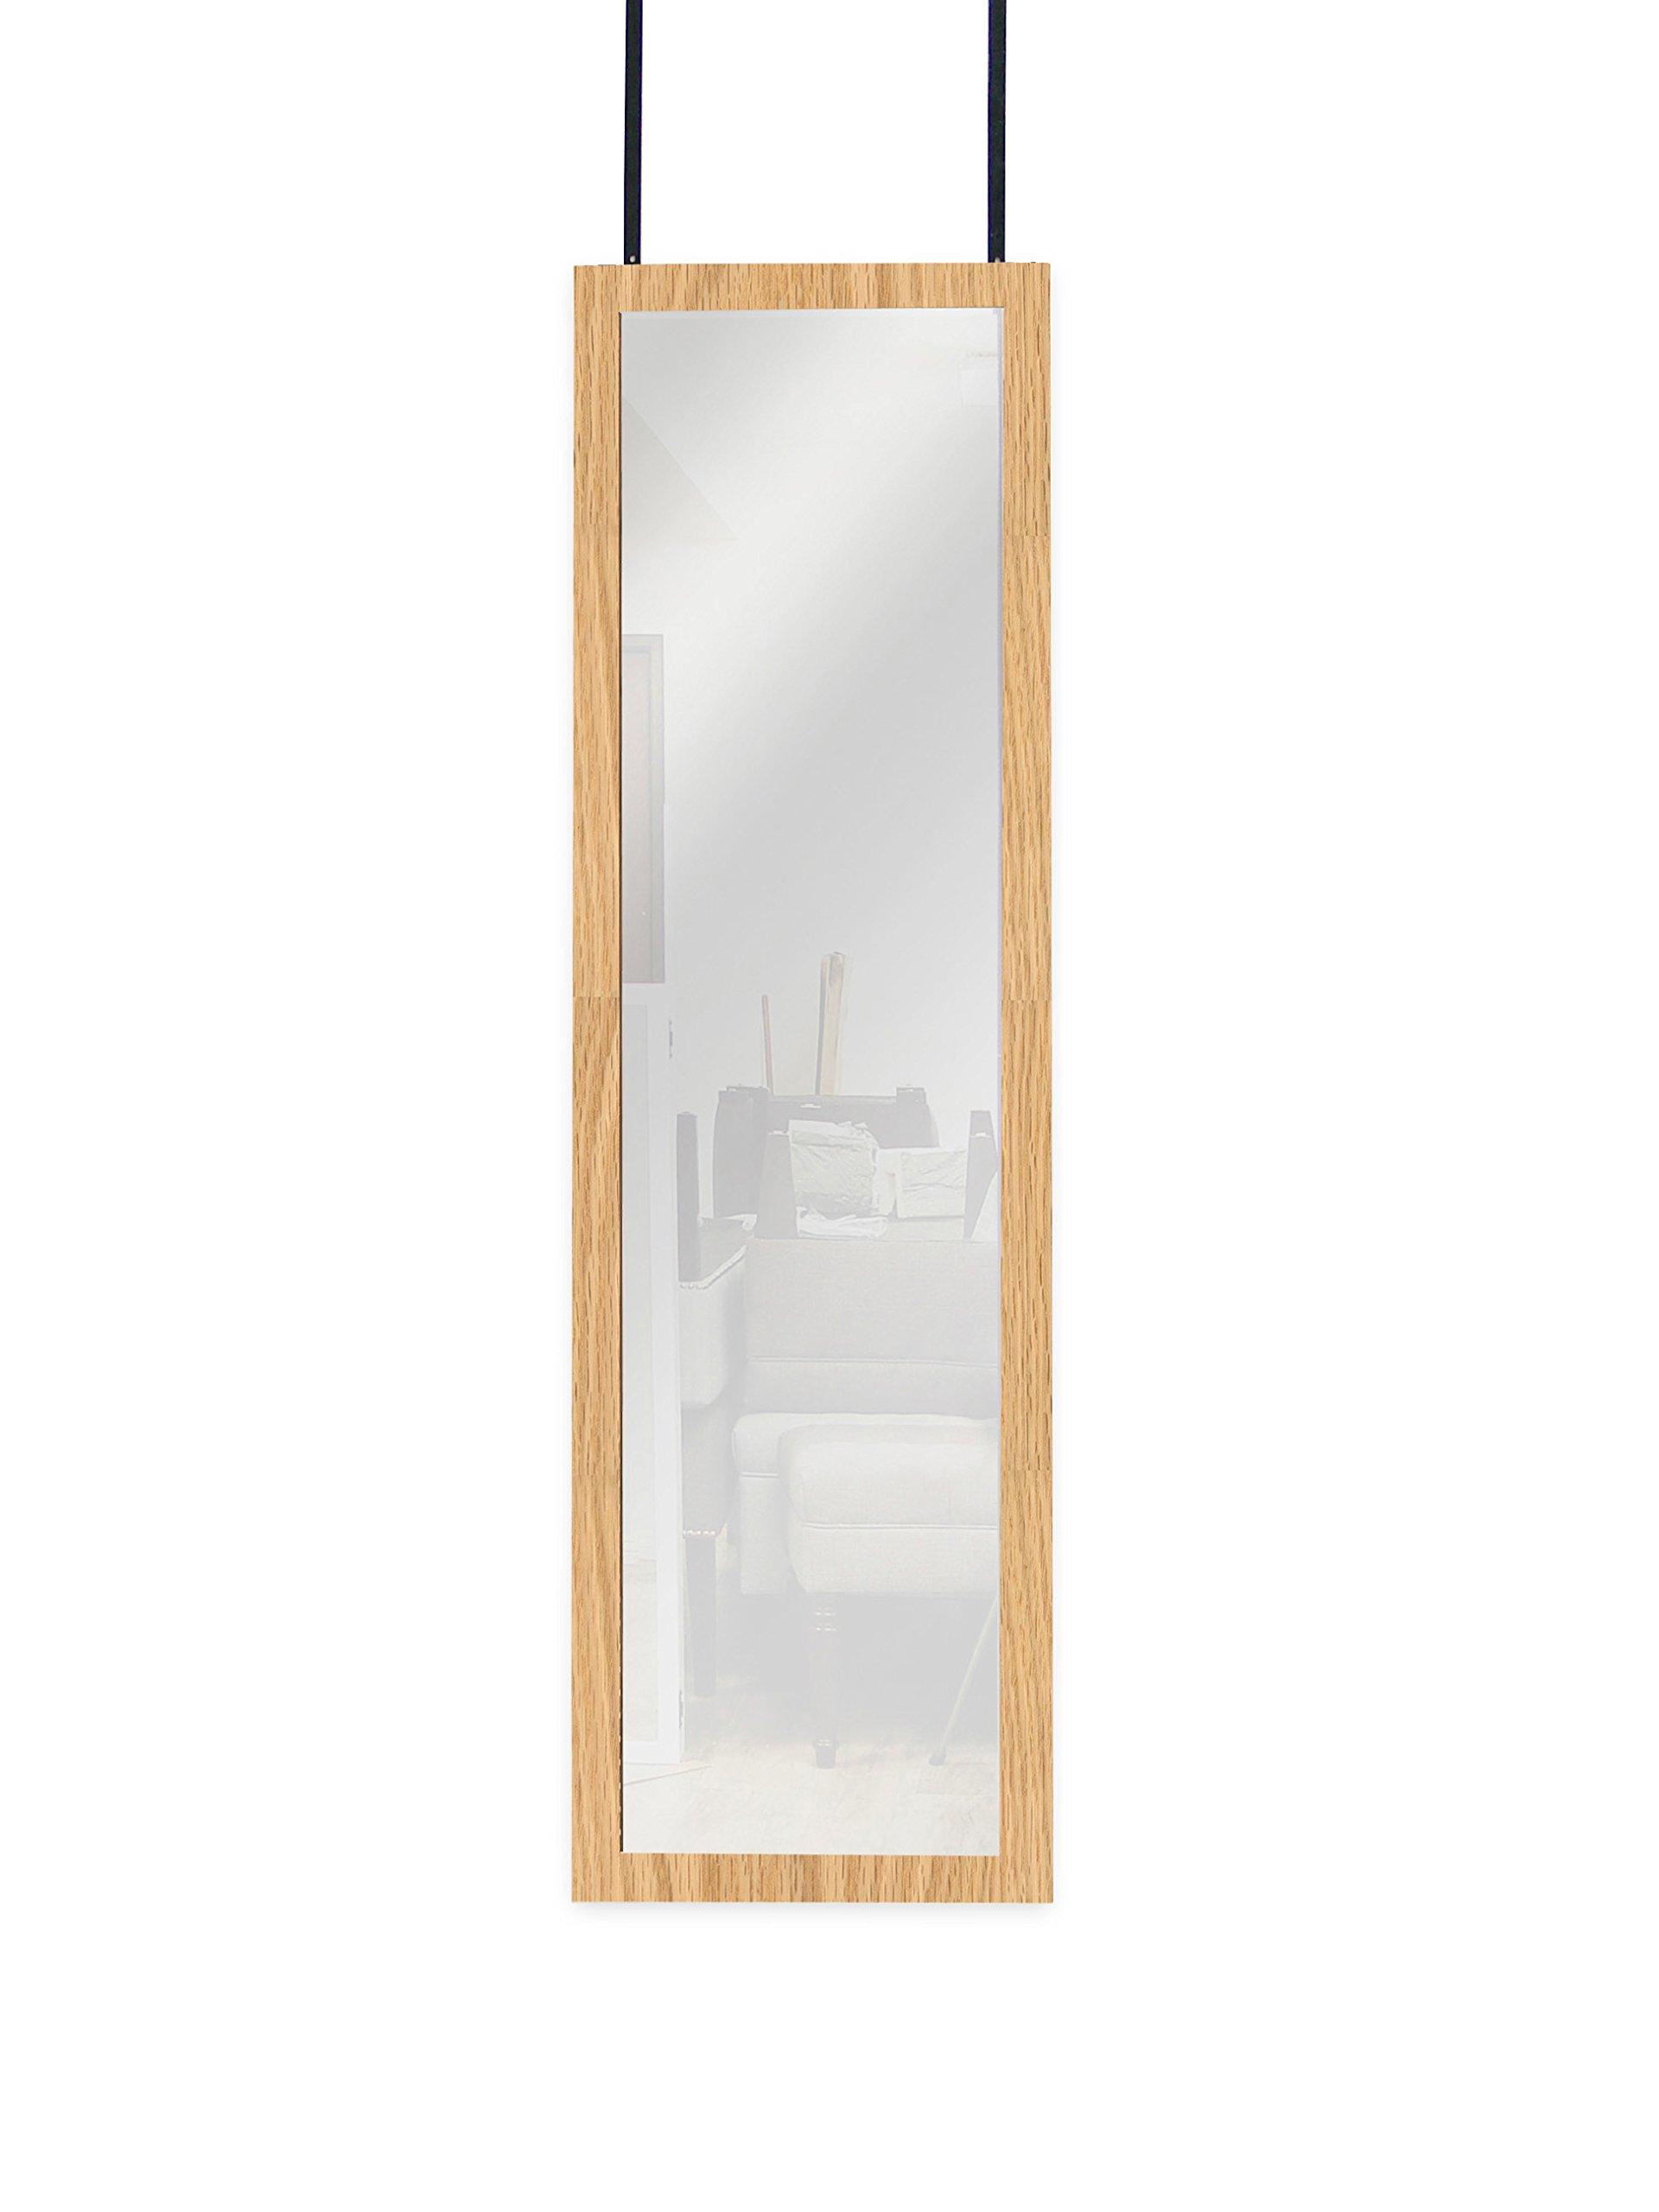 Mirrotek Over the Door Wall Mounted Full Length Door Dressing Mirror, Hardware Included, Oak Finish